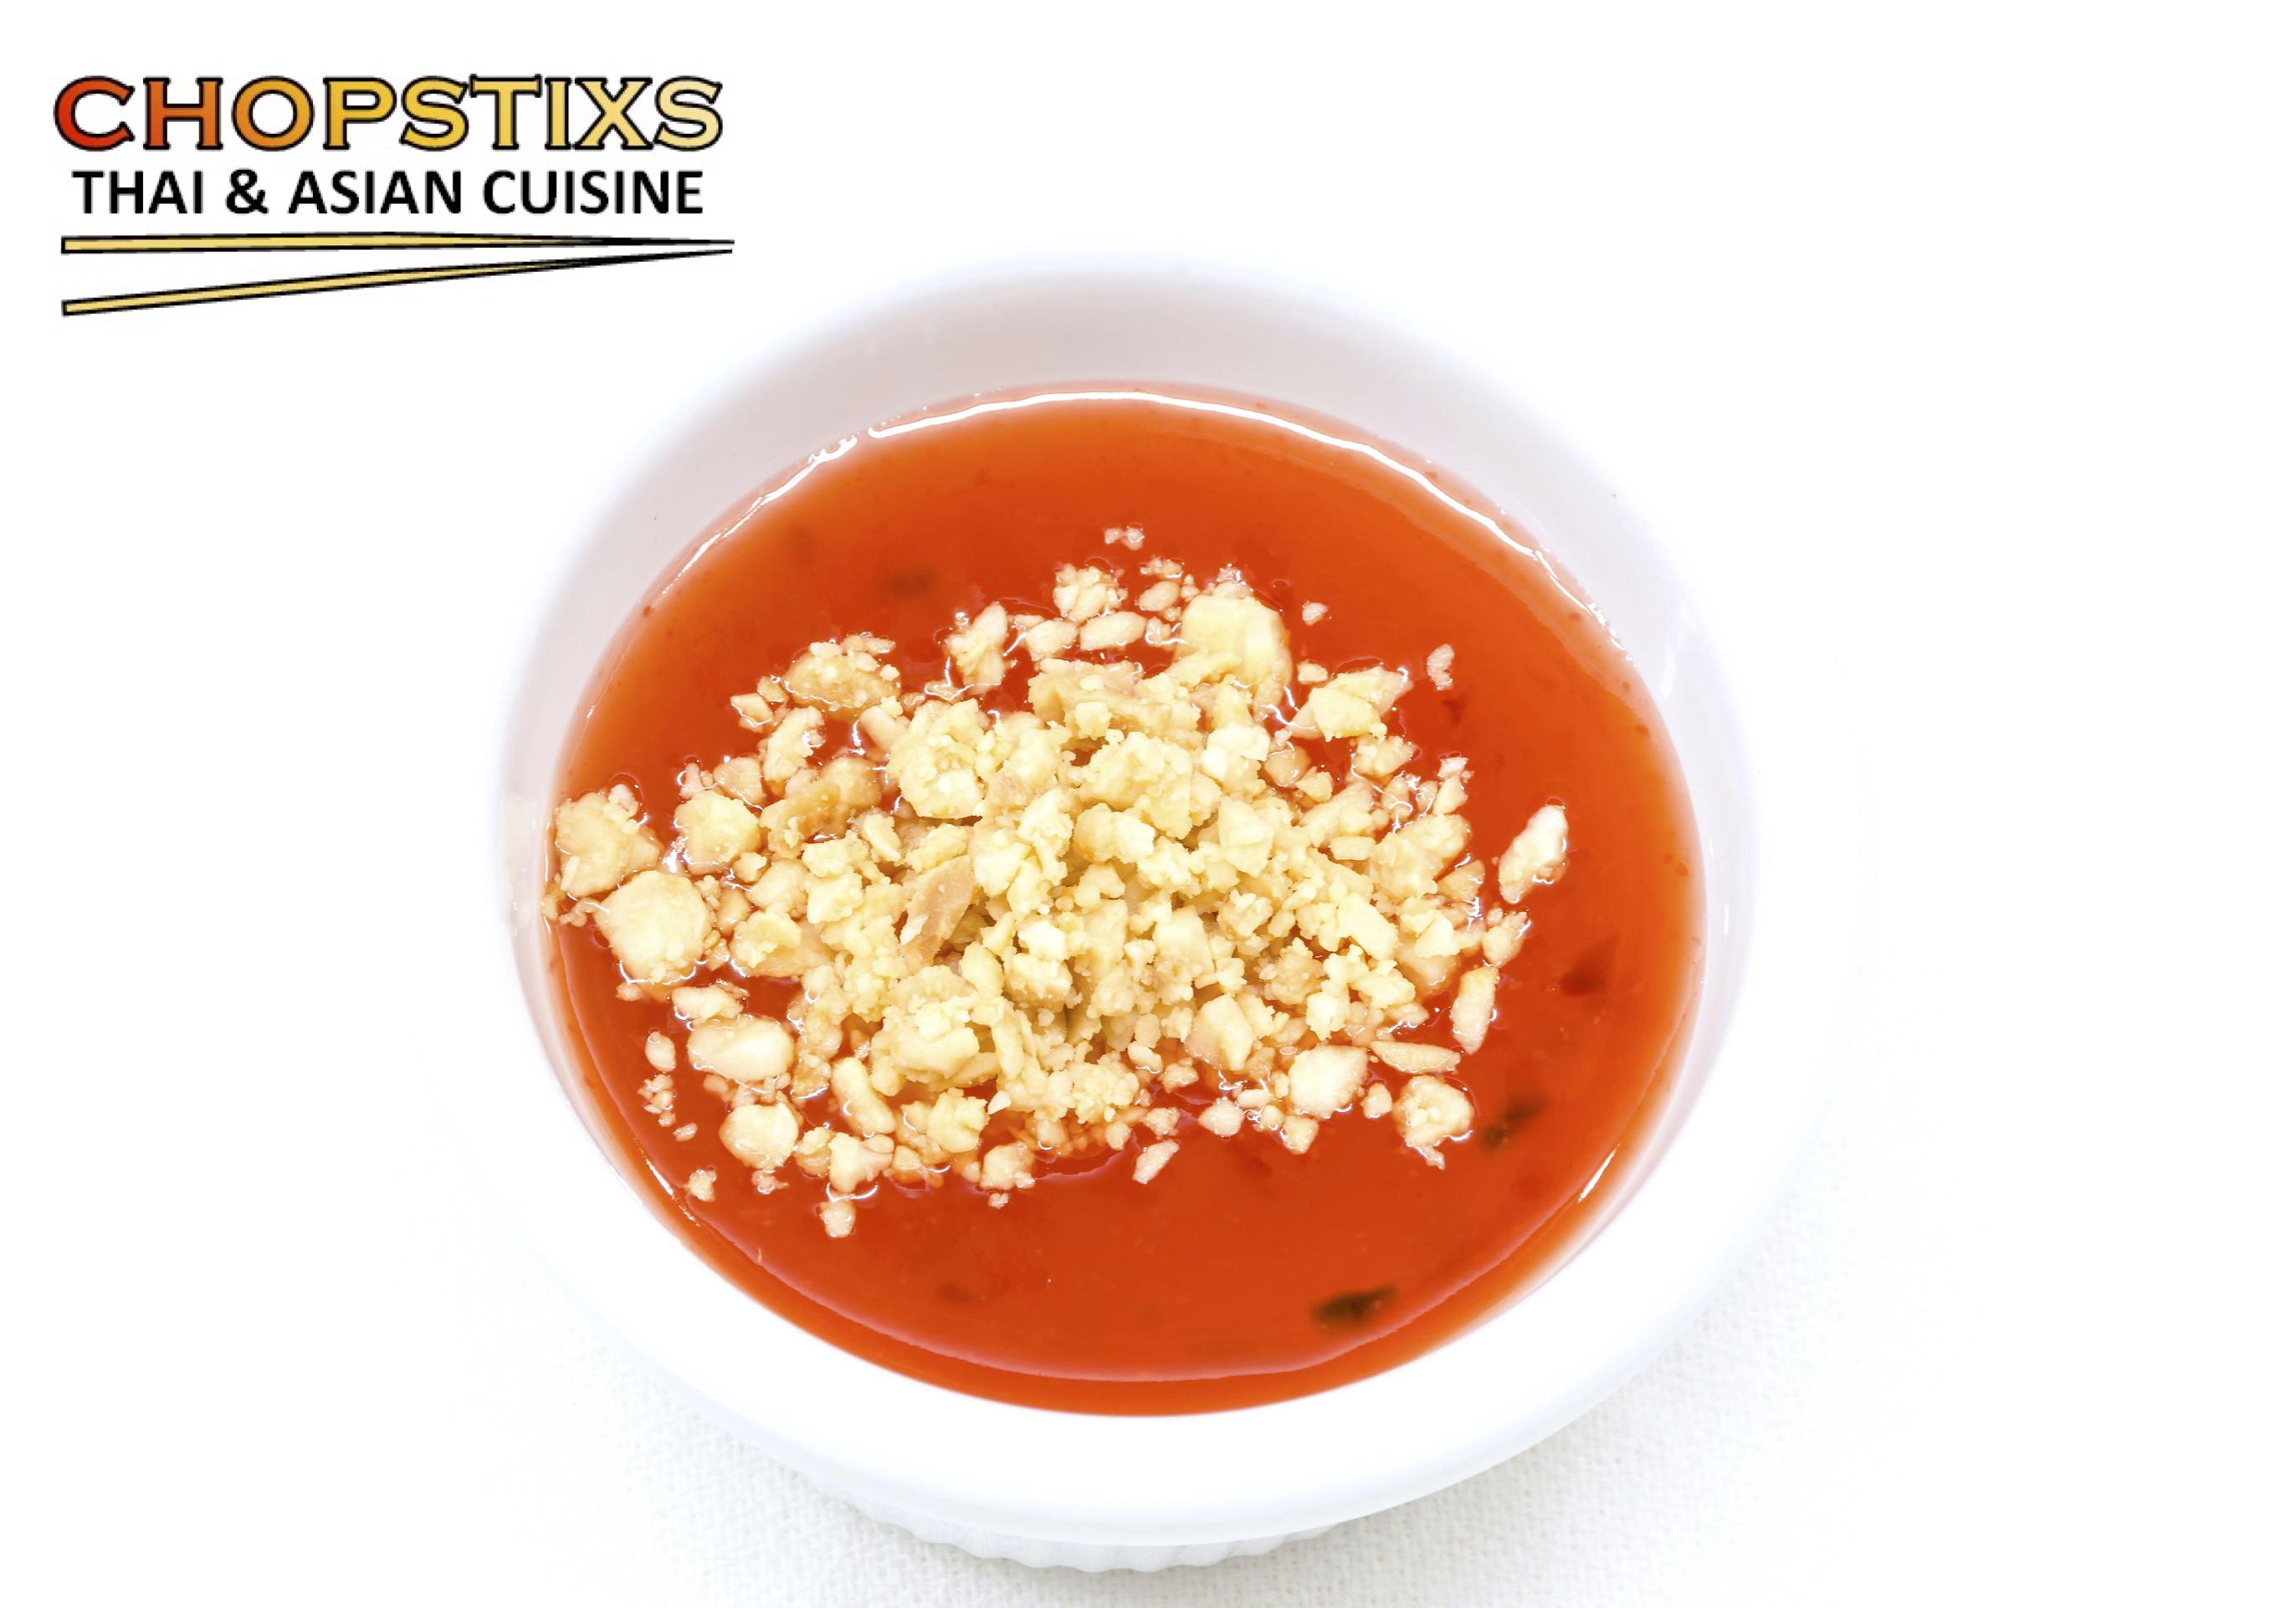 Sweet sauce W/ Ground peanut Image